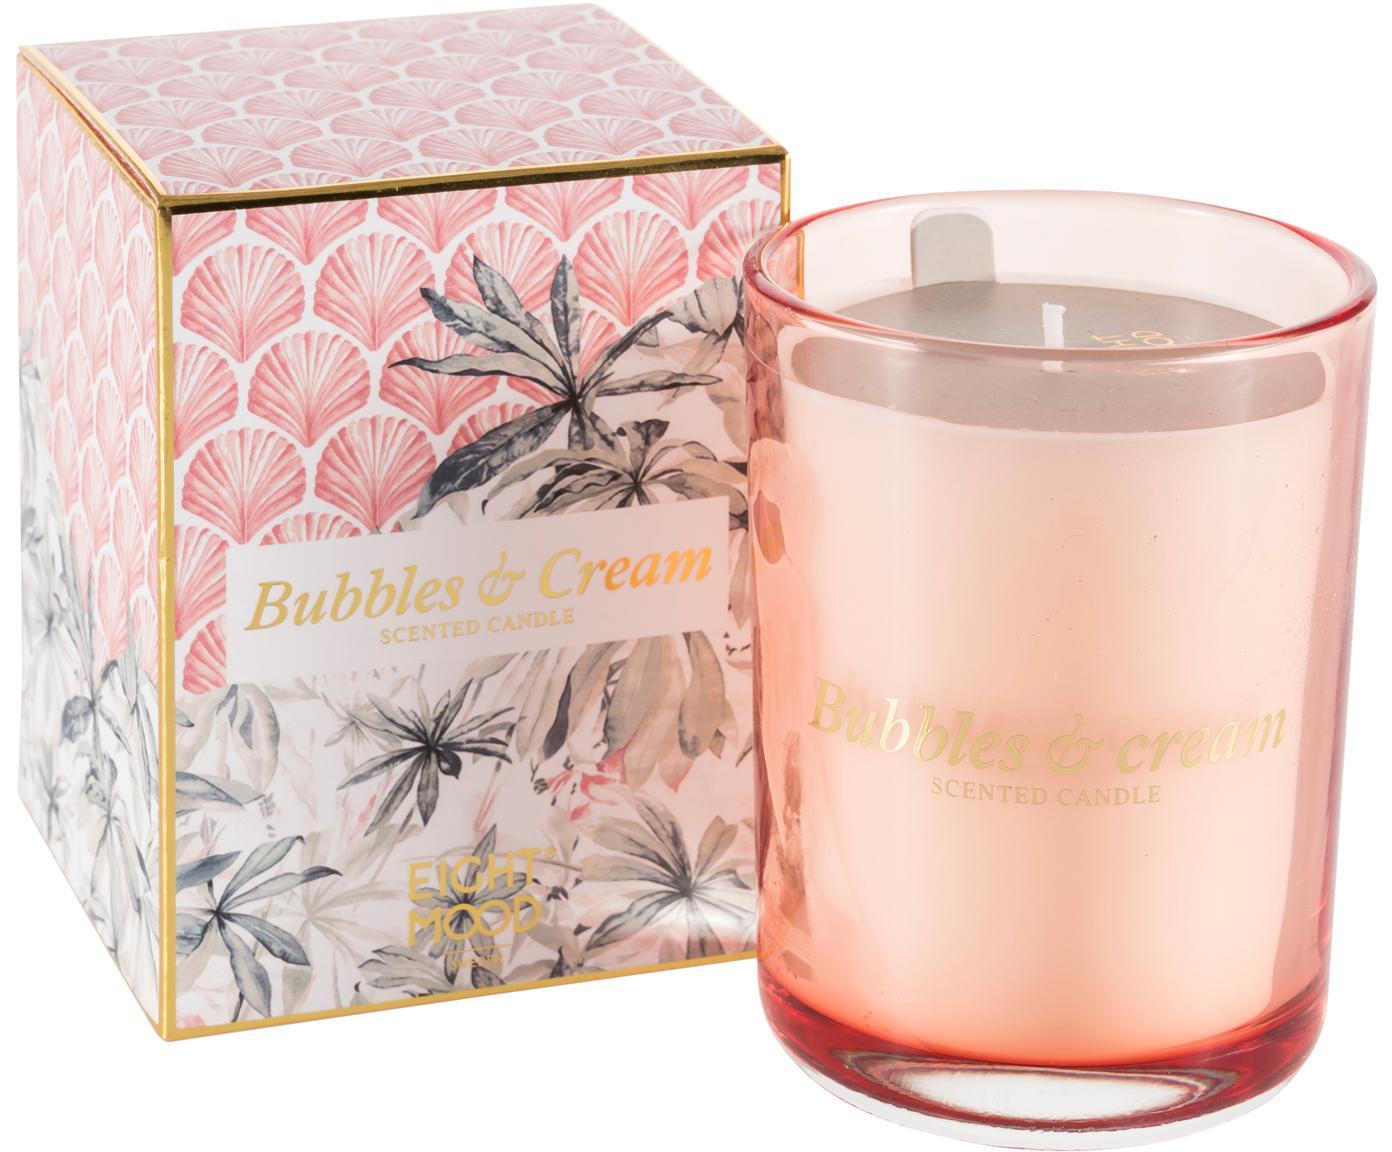 Vela perfumada Allure (agave amica, jazmín, madera de cedro), Caja: papel, Recipiente: cristal, Rosa, multicolor, An 9 x Al 12 cm